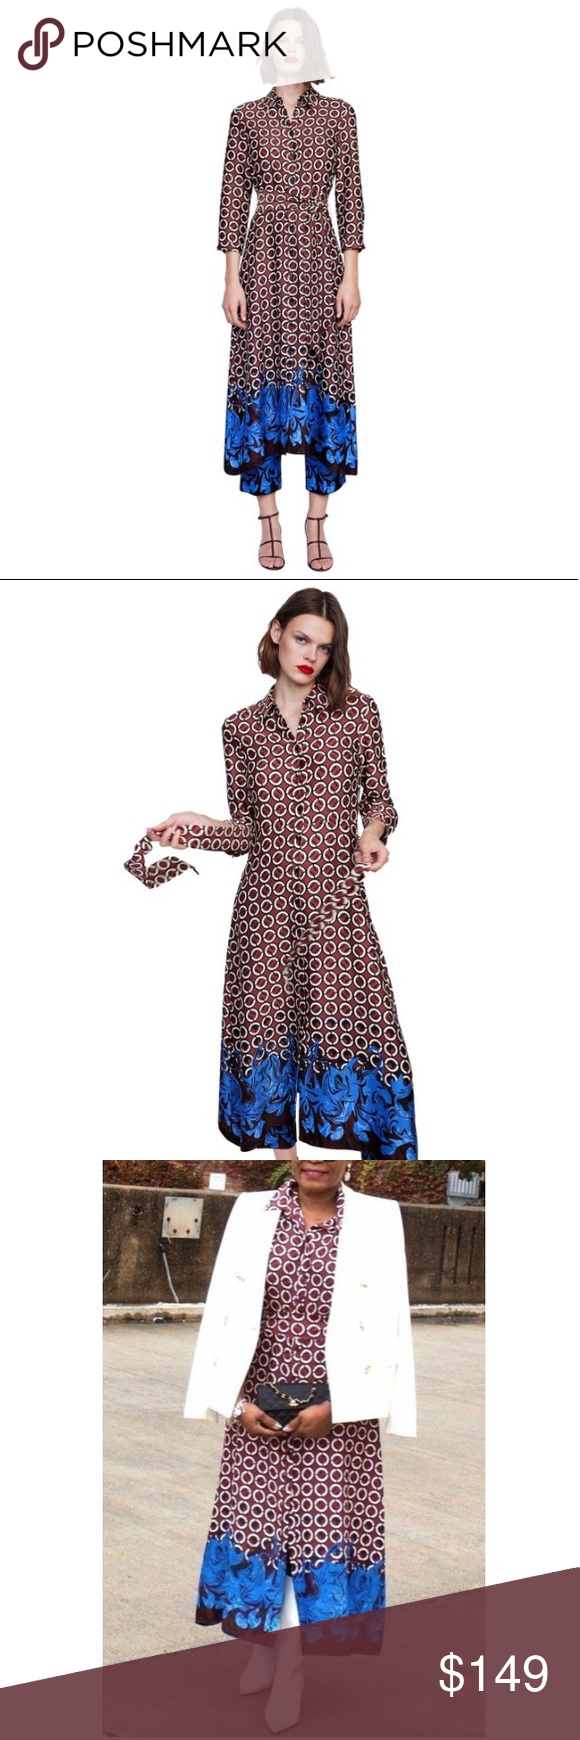 Zara Geometric Floral Print Tunic Maxi Dress Zara